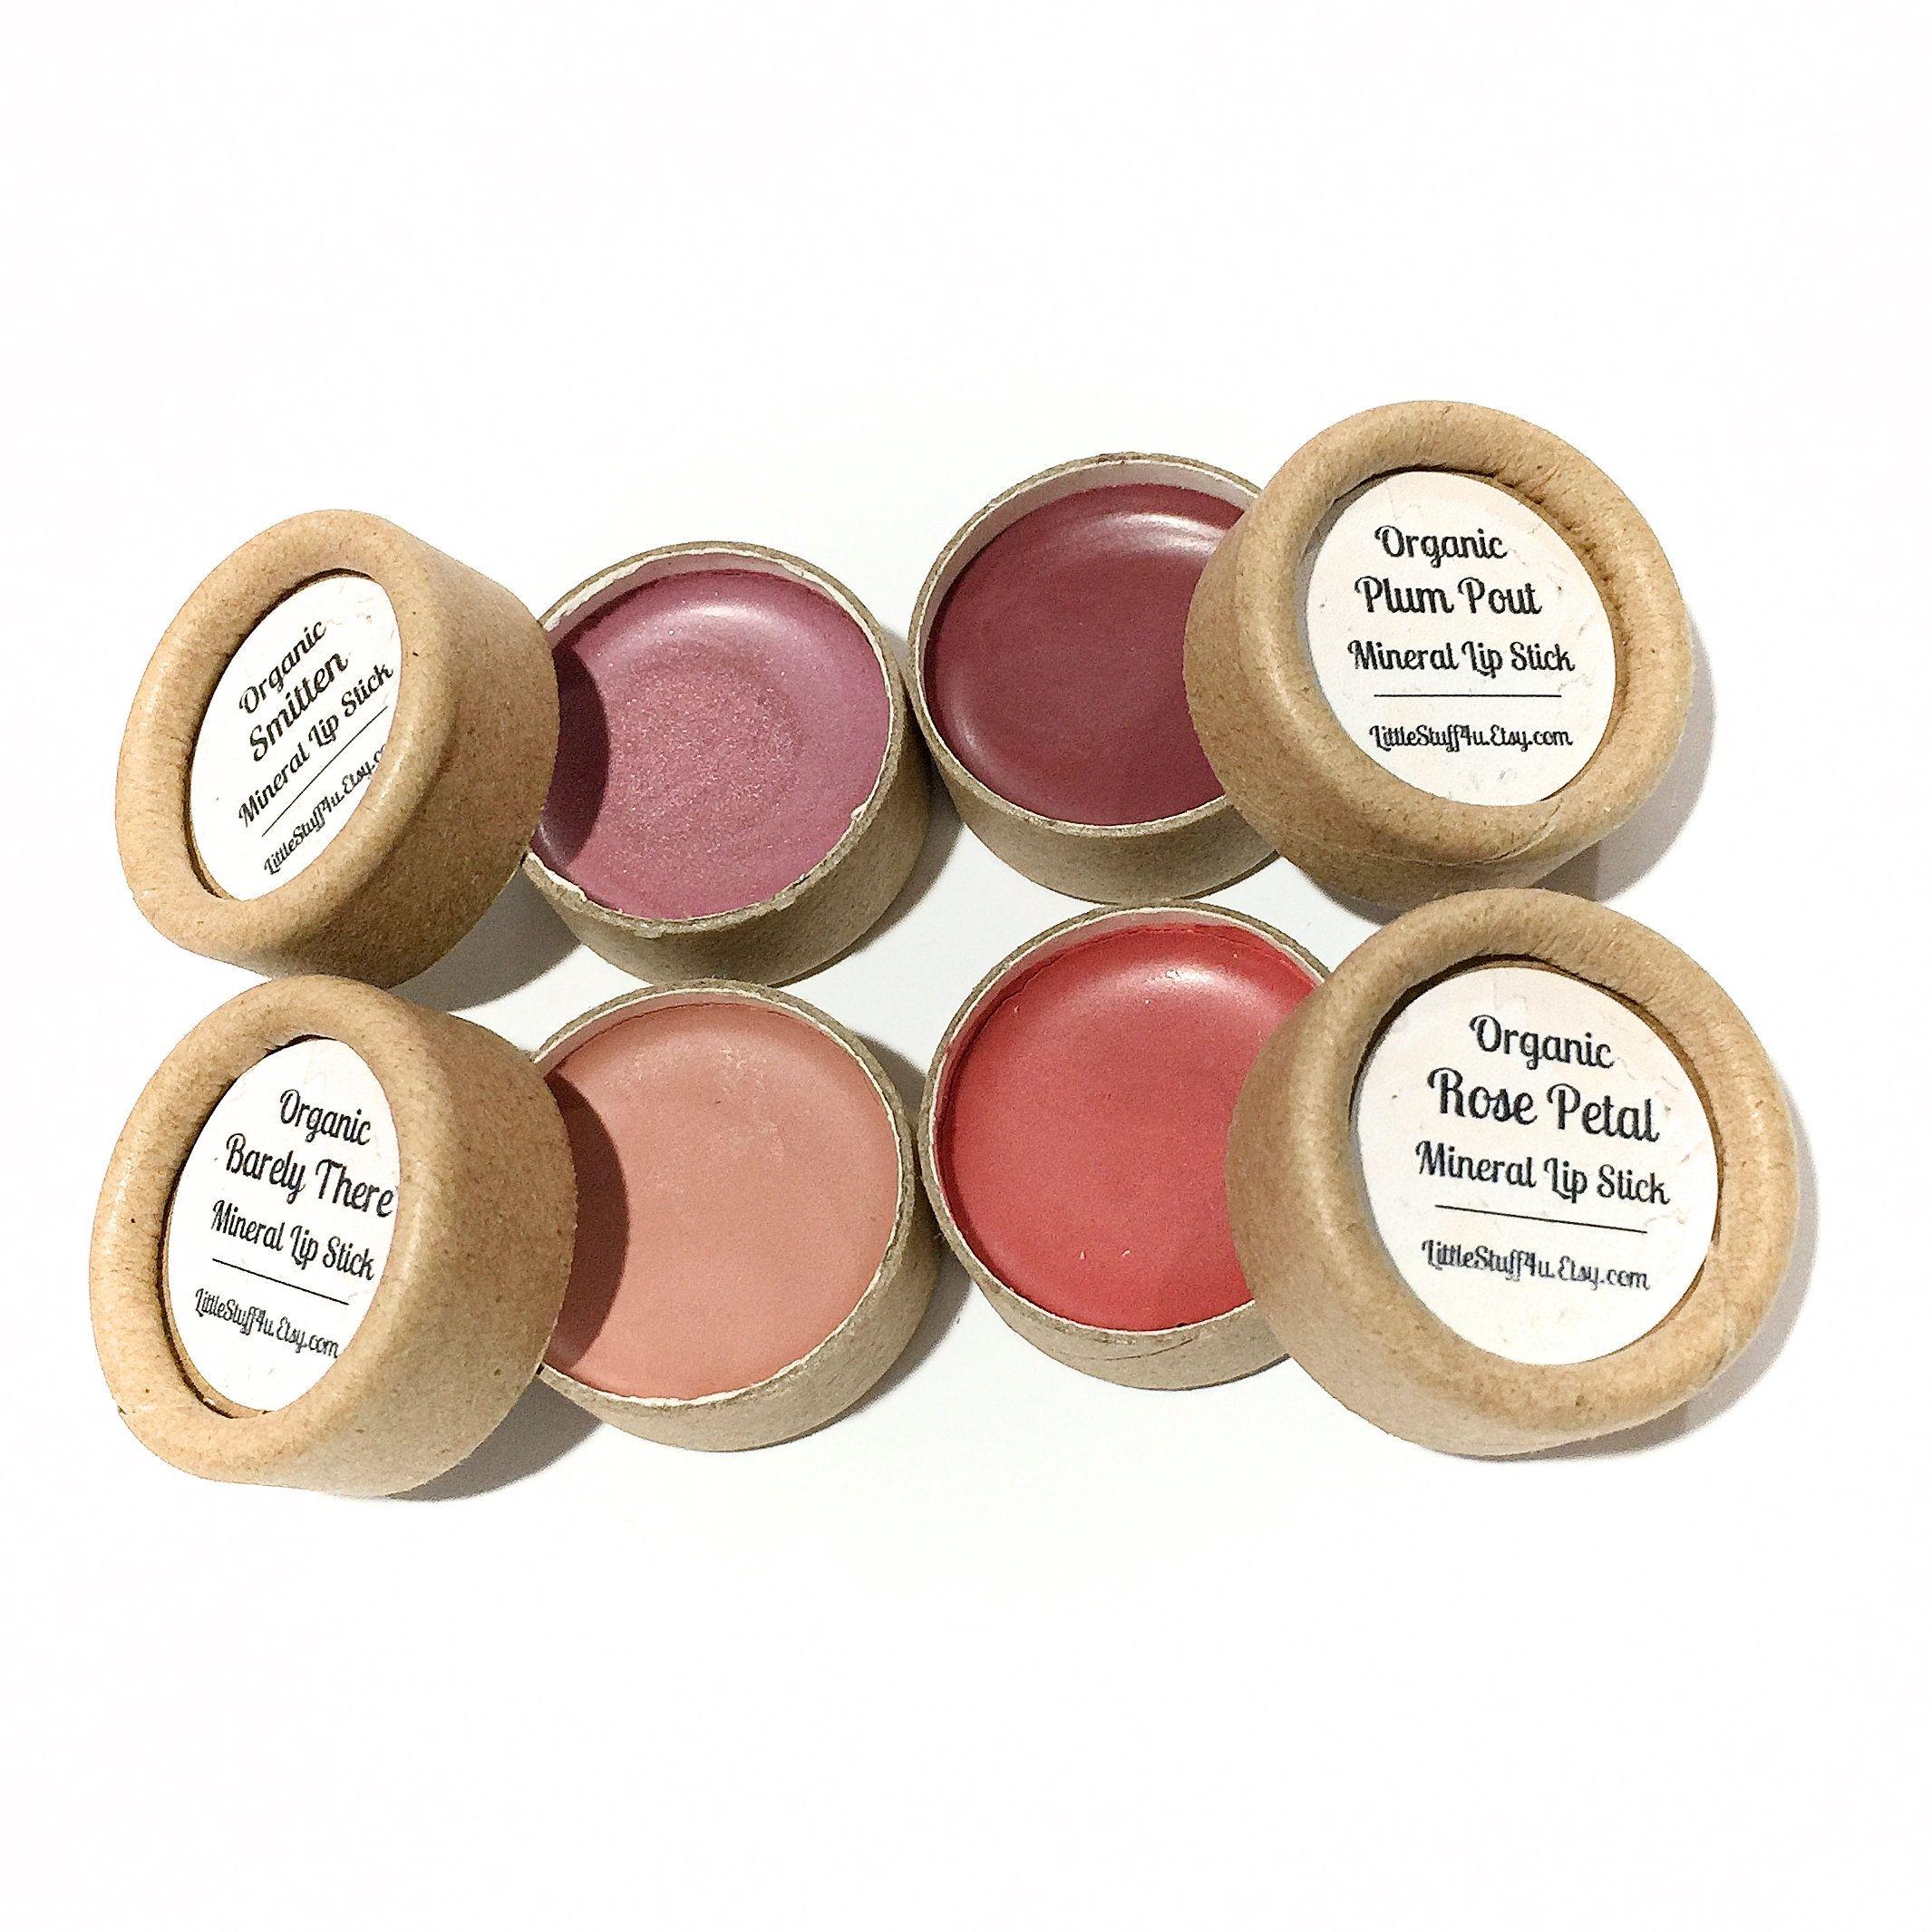 ORGANIC Lipstick SAMPLES Eco Friendly Paperboard Lippy